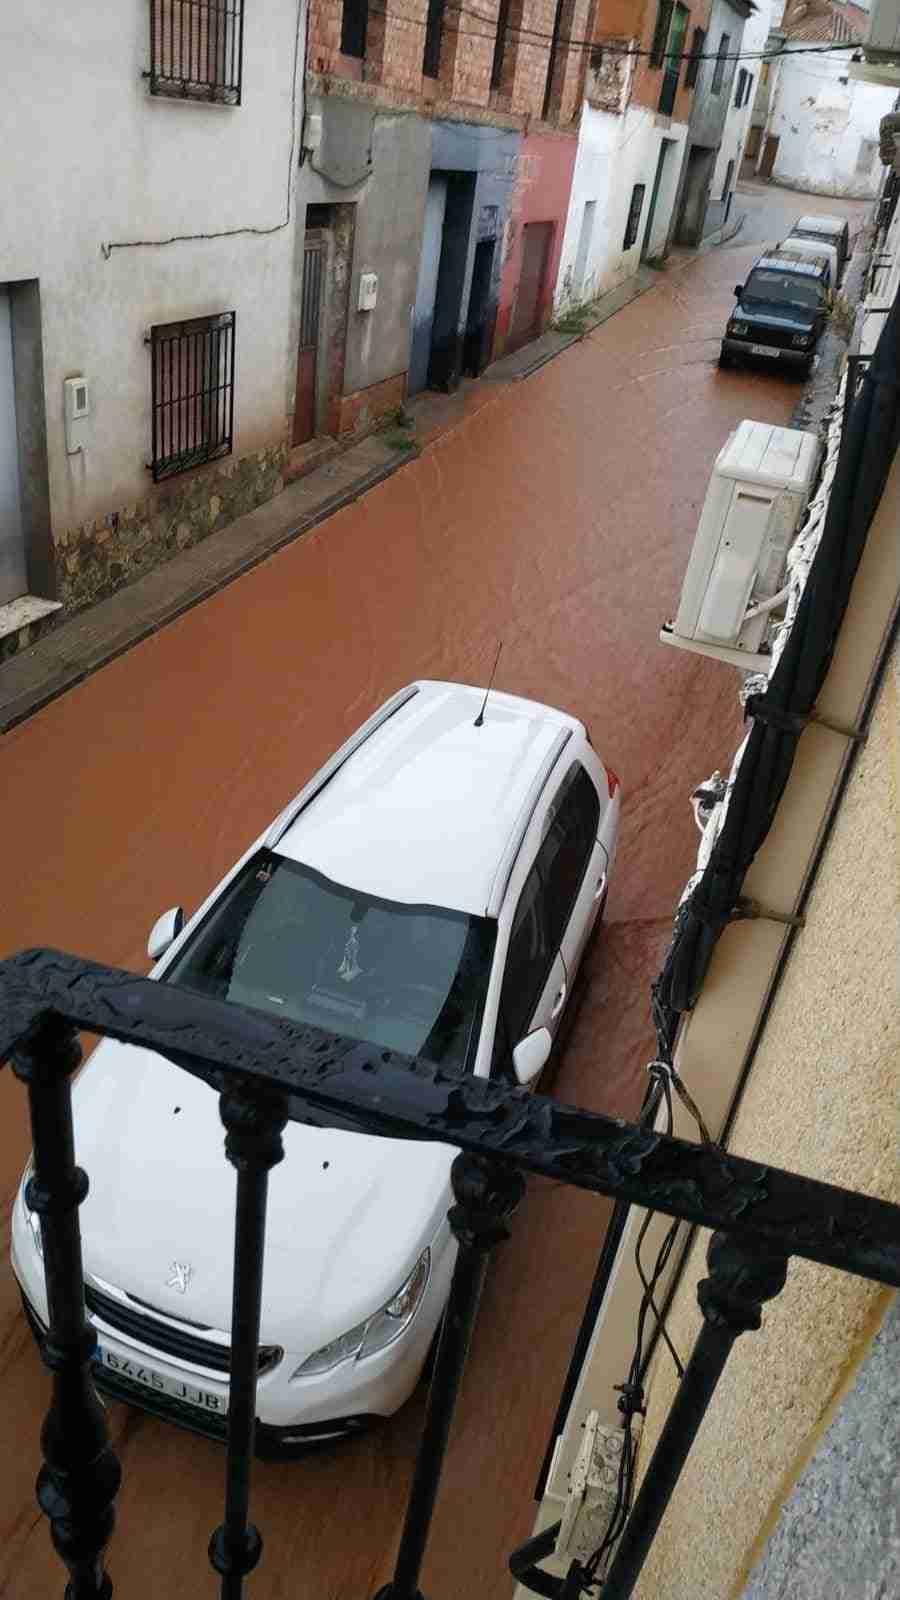 Una fuerte tormenta anegó esta tarde el casco de Carrizosa, donde aguantó el nuevo canal, aunque se desbordó por el fuerte arrastre 5